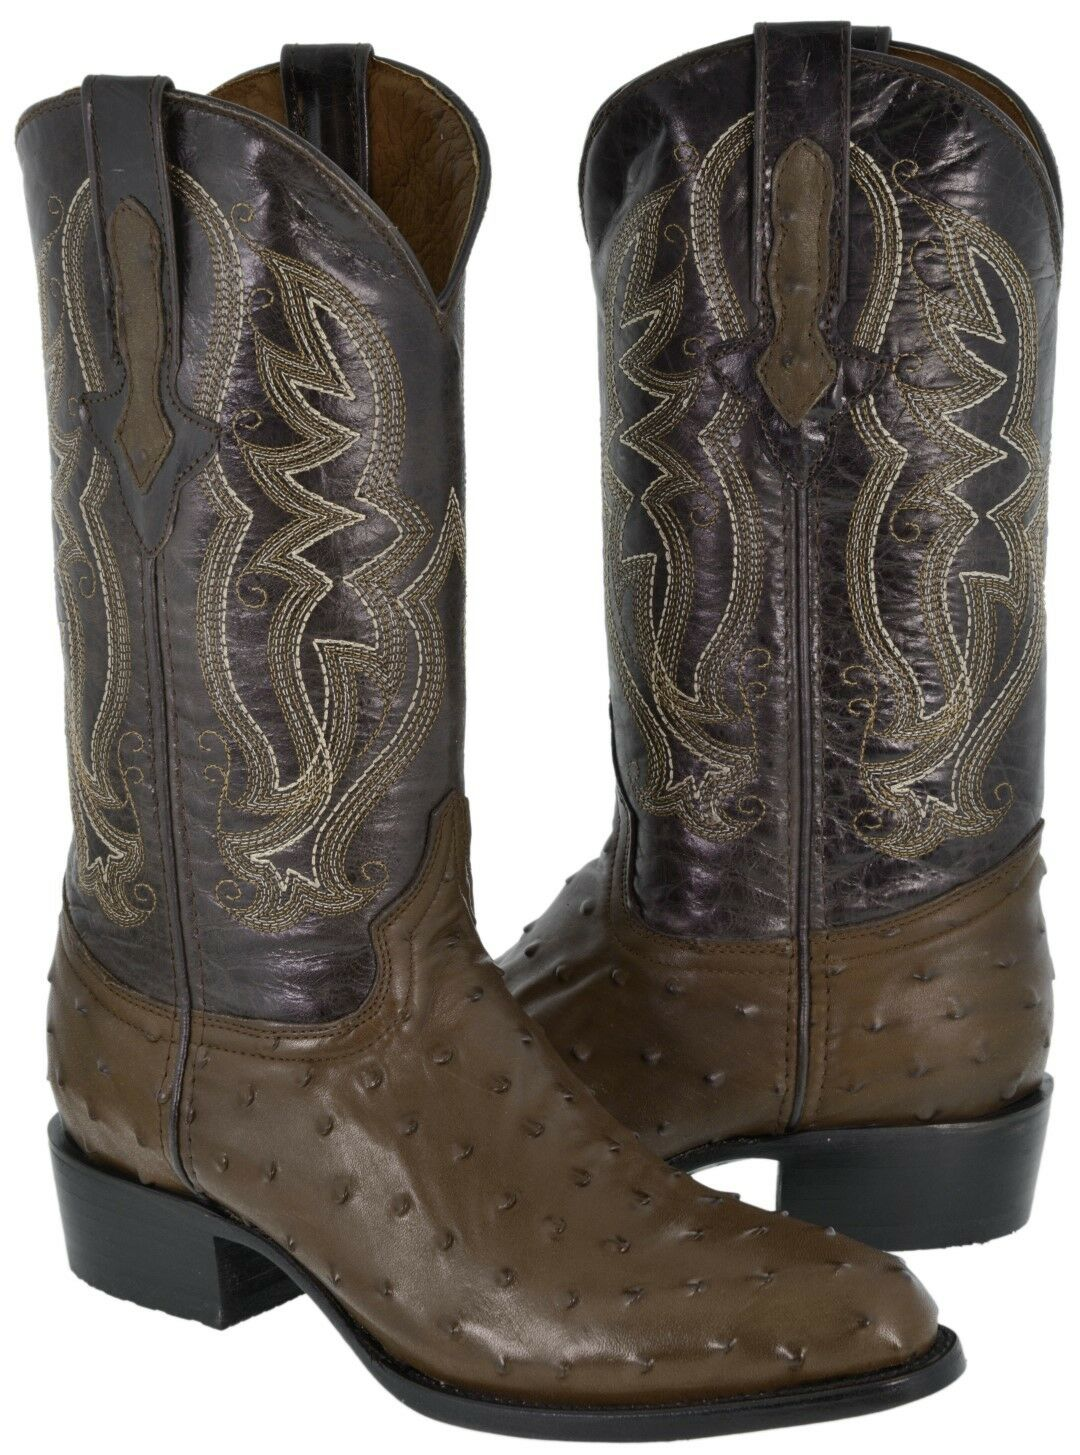 Mens braun Round Toe Ostrich Print Western Wear Leather Cowboy Stiefel